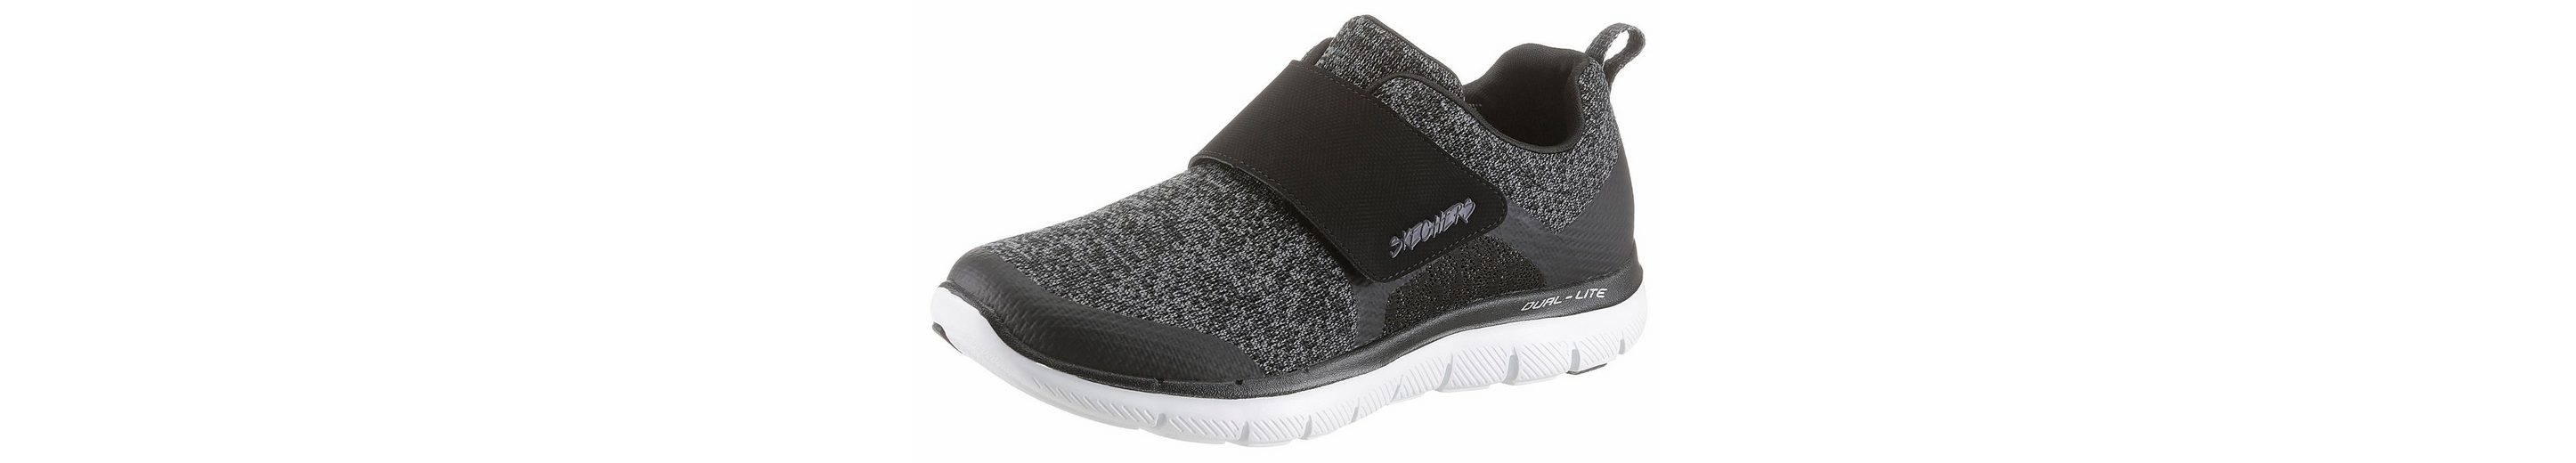 Skechers Flex Appeal 2.0 Step Forward Slipper, mit Klettverschluss